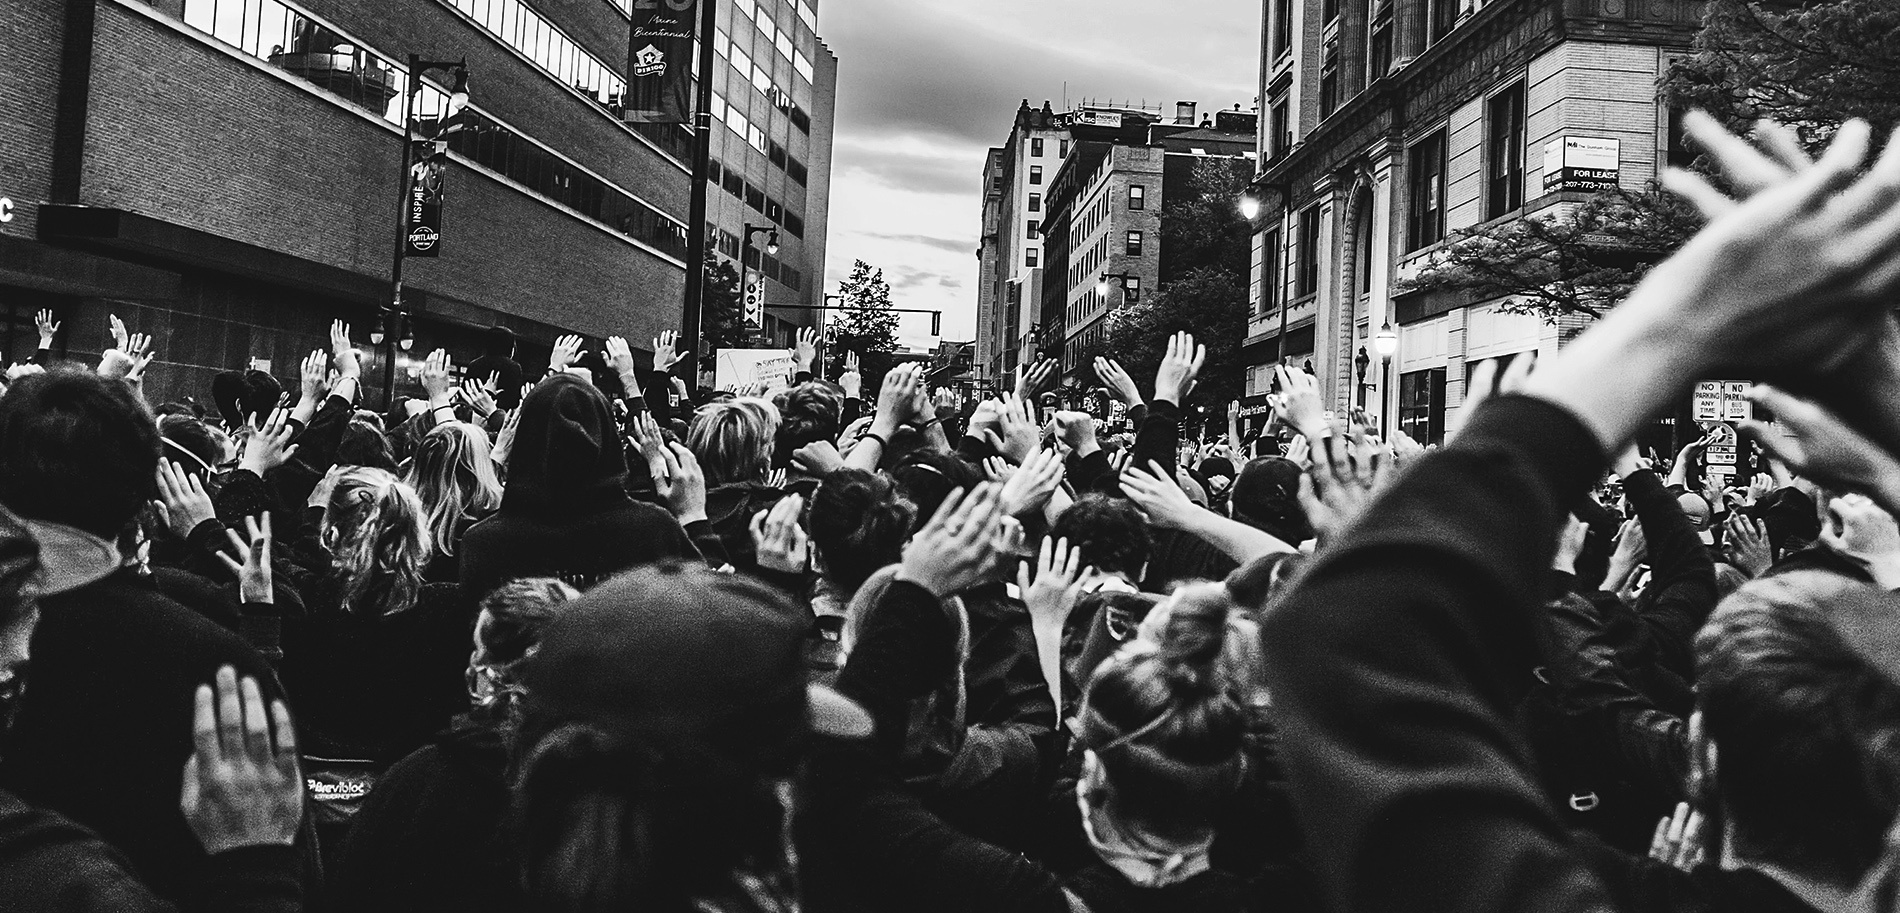 Image of protestors